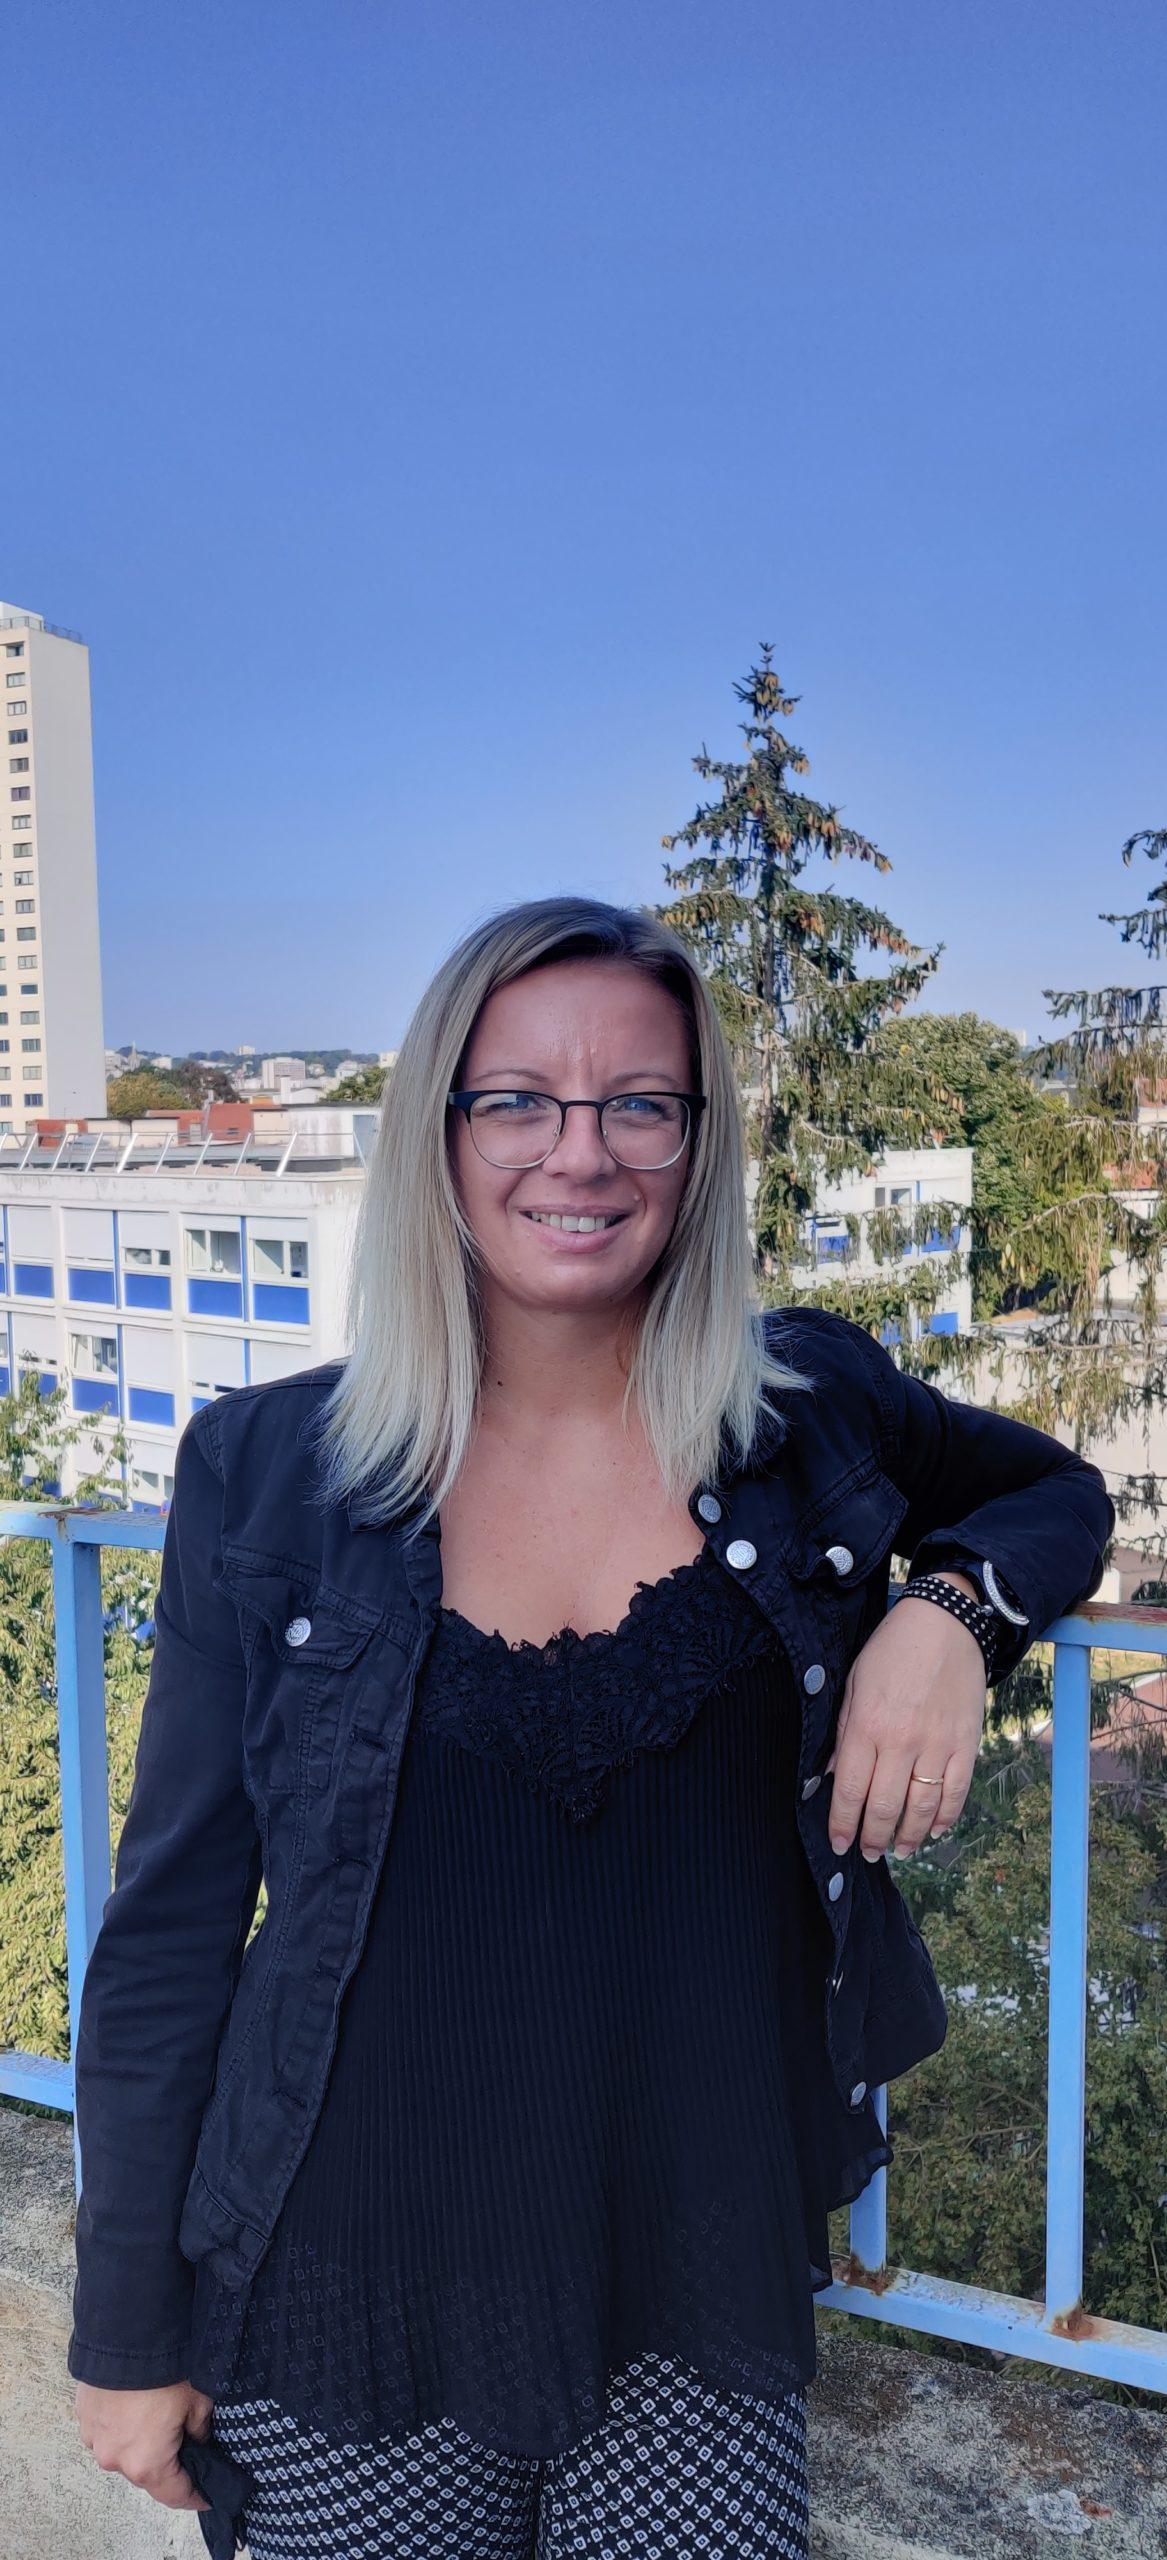 Adeline Simon